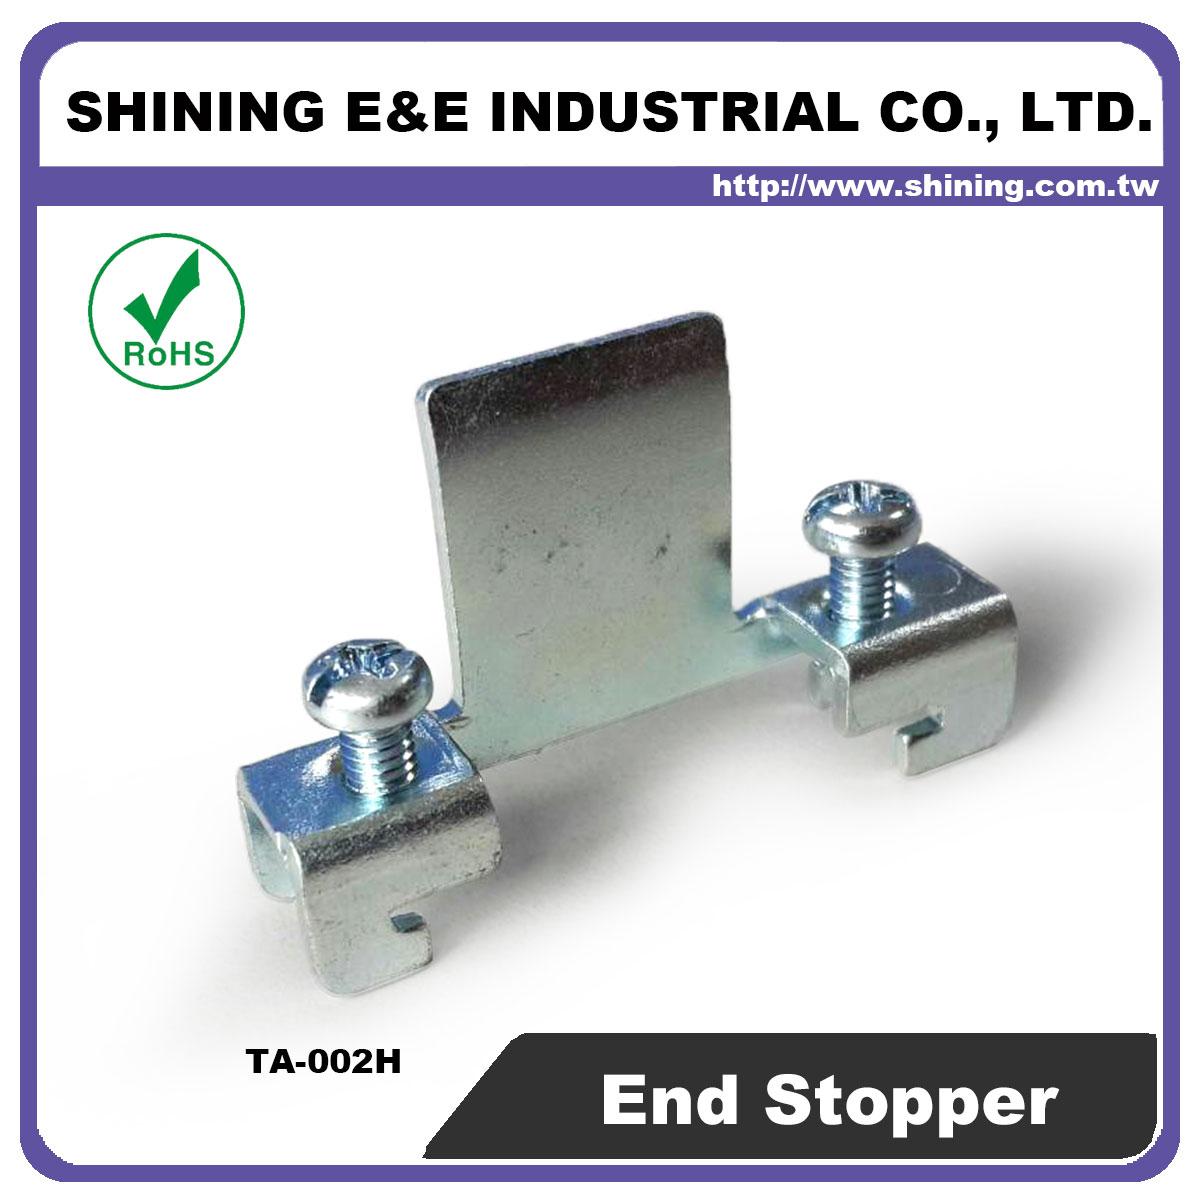 TA-002H Steel End Bracket For 35mm Din Mounting Rail - TA-002H 35mm Steel End Bracket